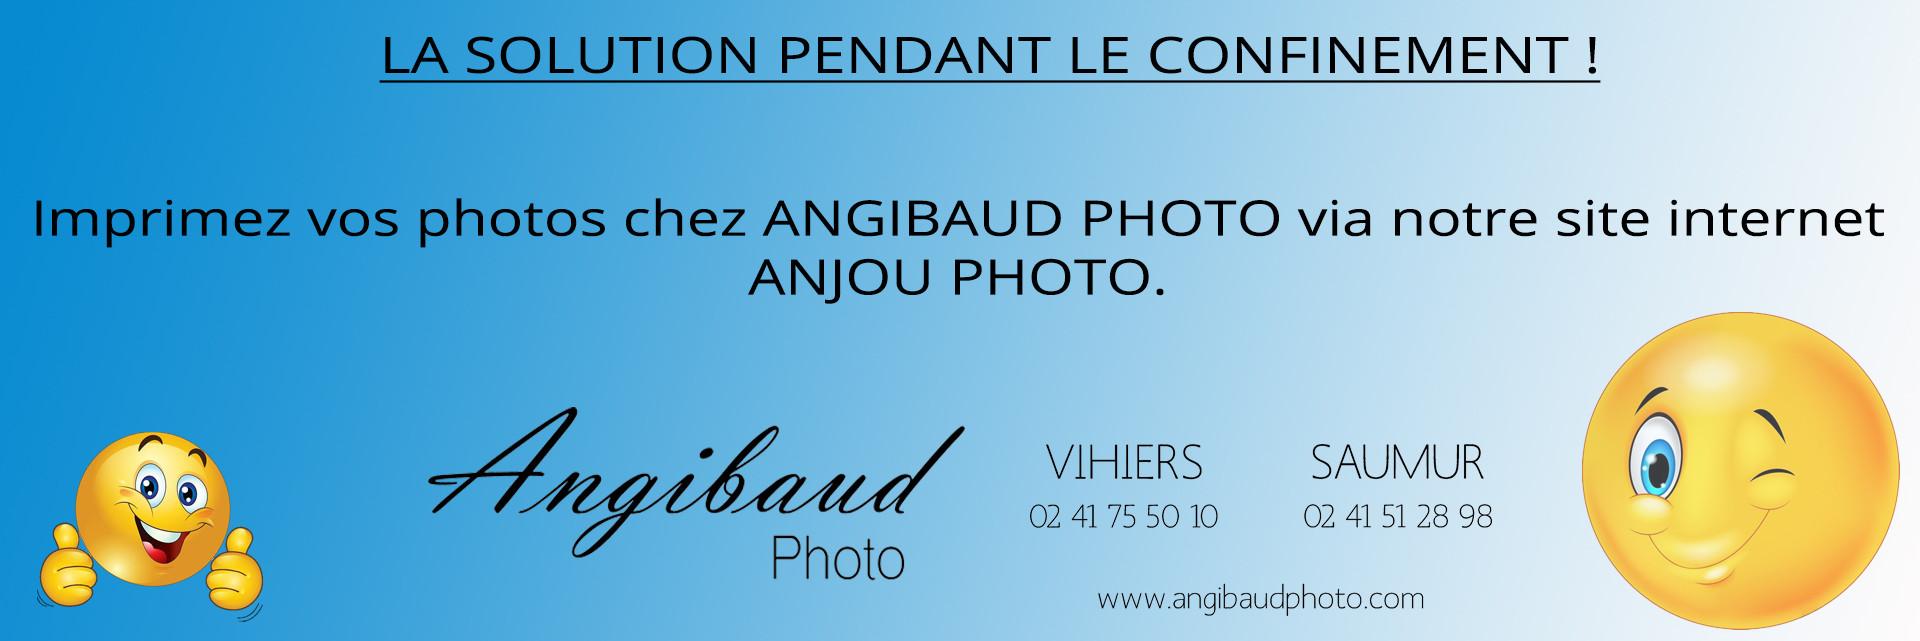 Anjou Photo filiale d' Angibaud Photo